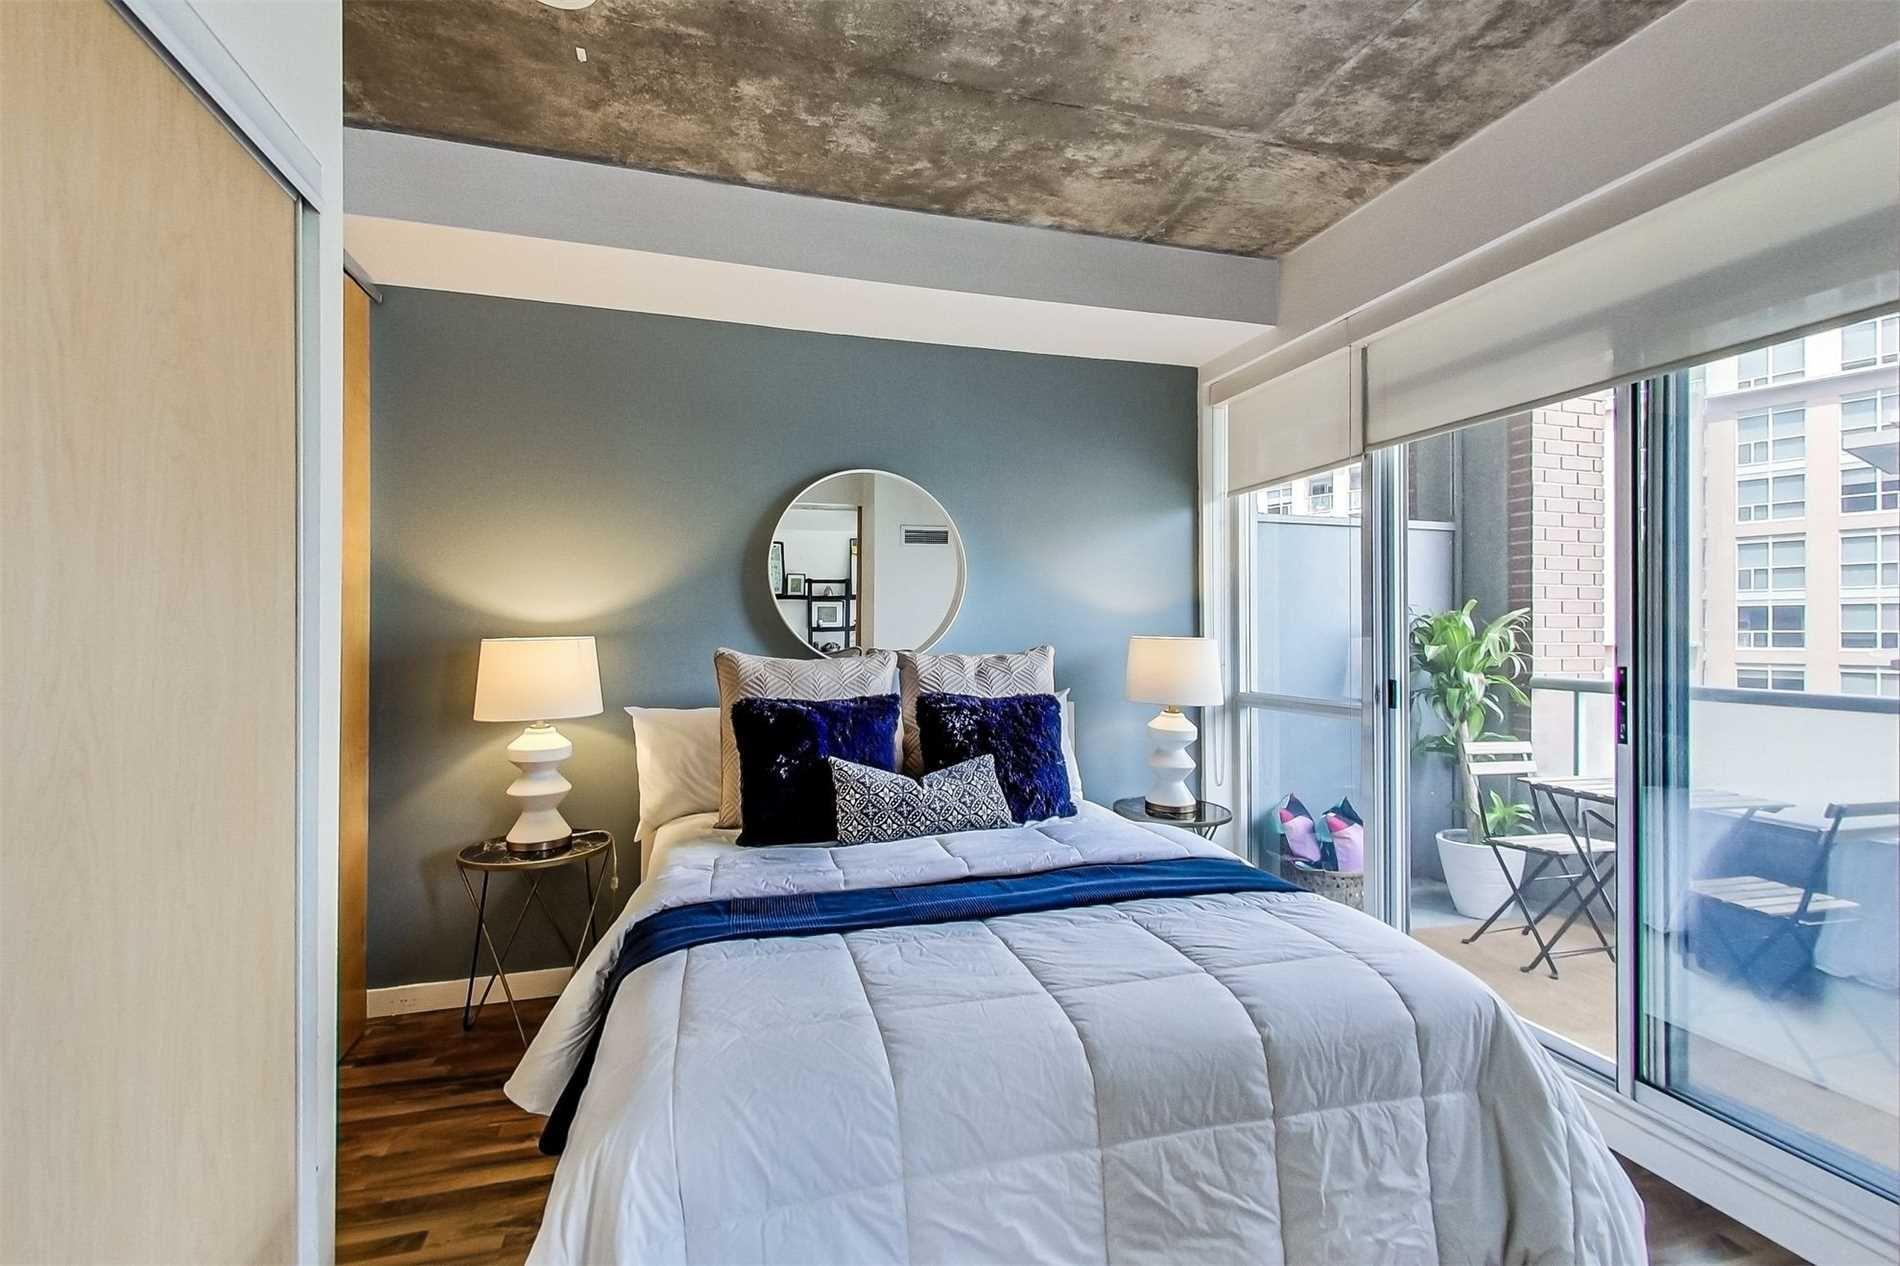 Photo 8: Photos: 307 1 Shaw Street in Toronto: Niagara Condo for sale (Toronto C01)  : MLS®# C4525736